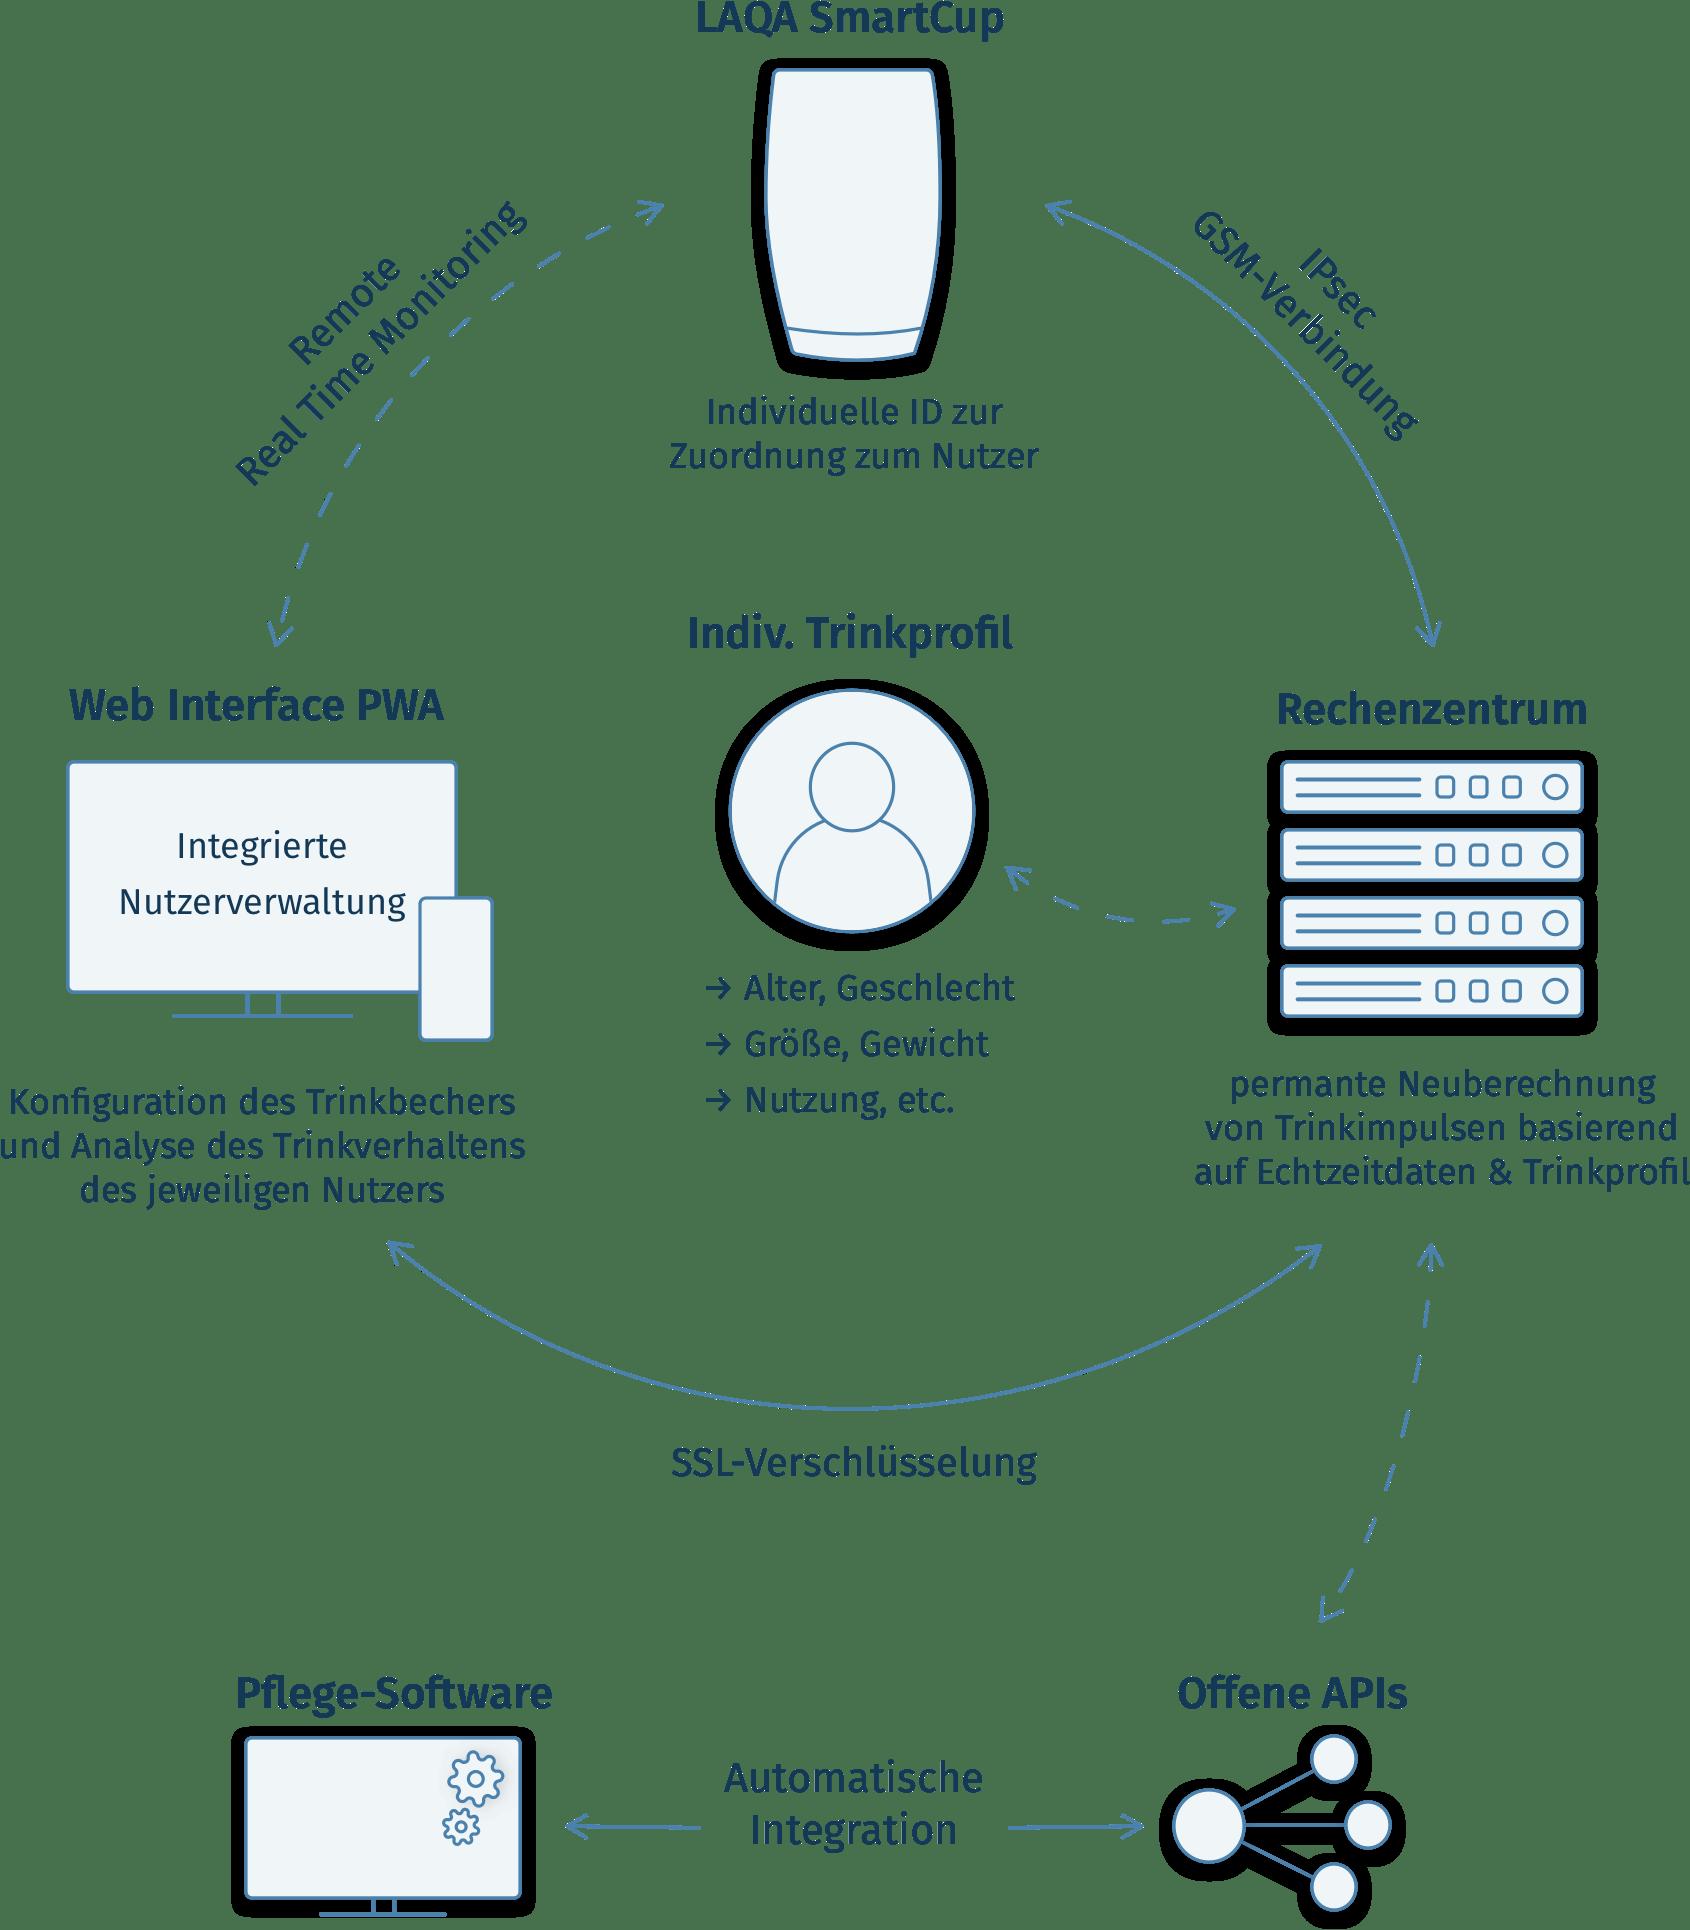 LAQA SmartCup information flow